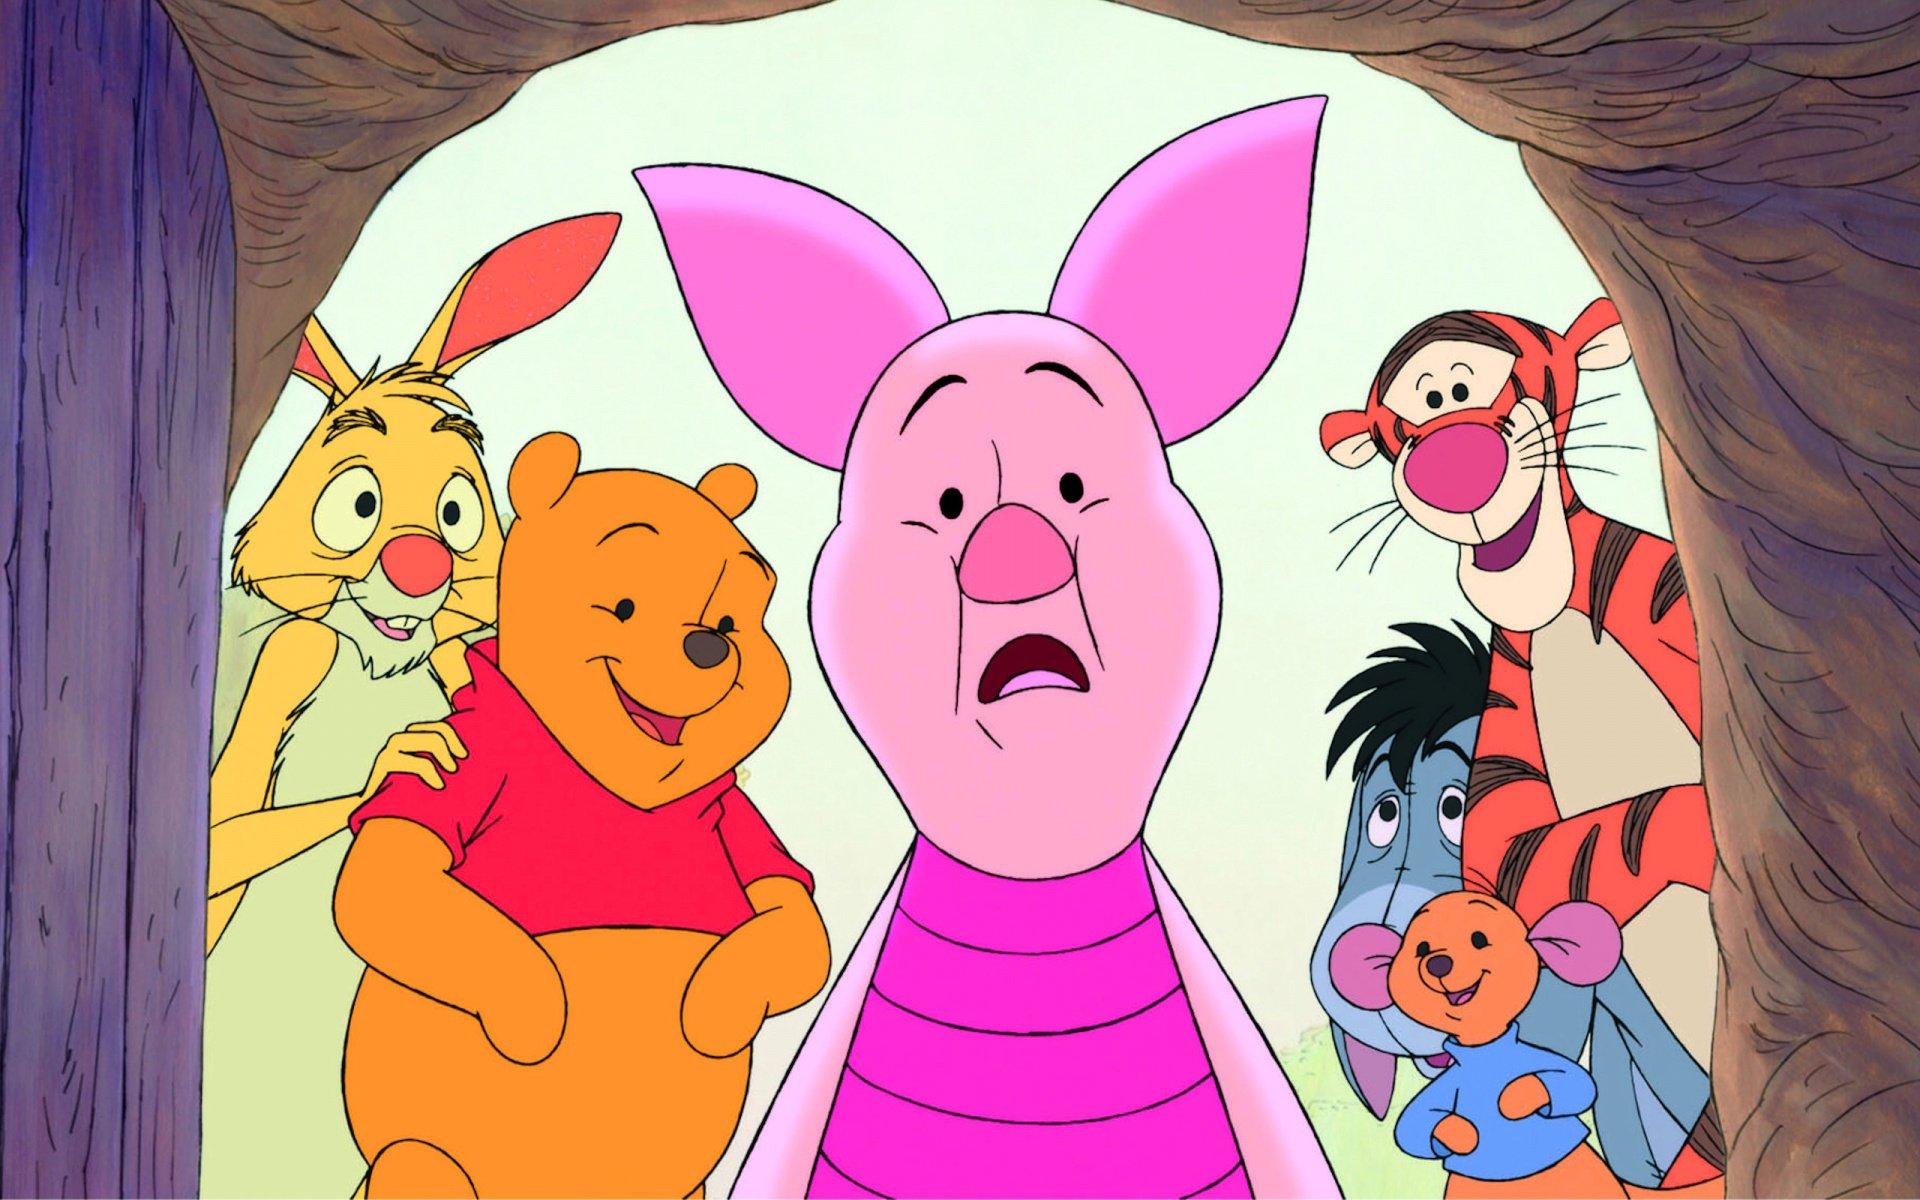 Piglet pooh winnie the pooh disney piglet